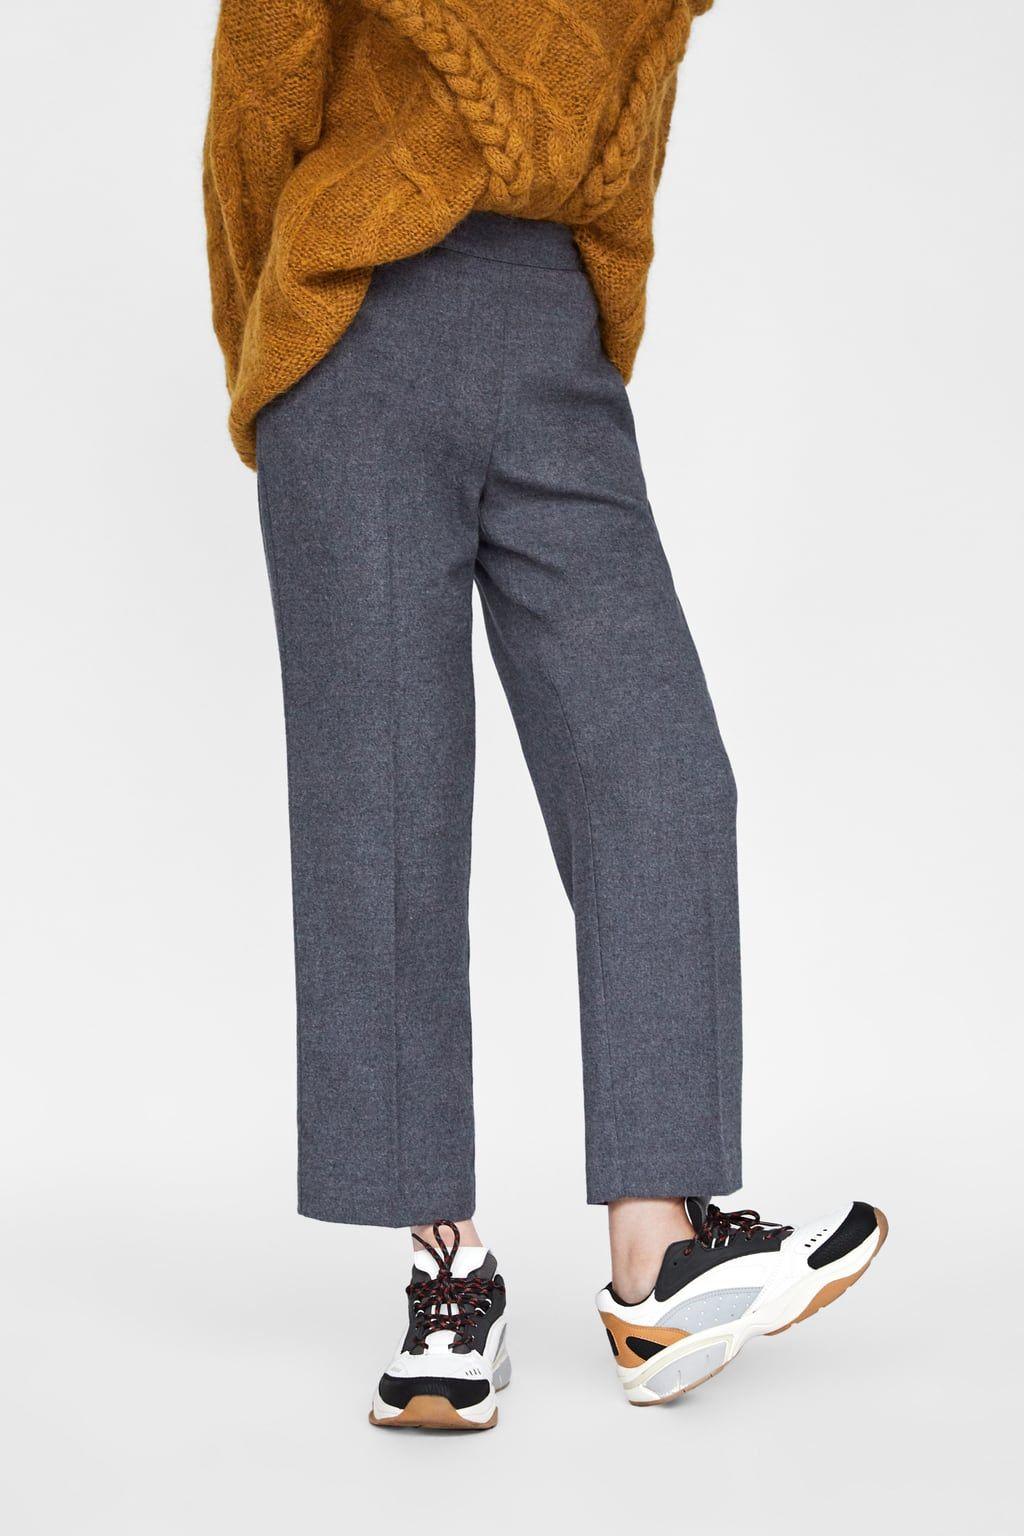 1db10d77 Soft feel cigarette pants   Fall Clothing Inspiration   Pants ...